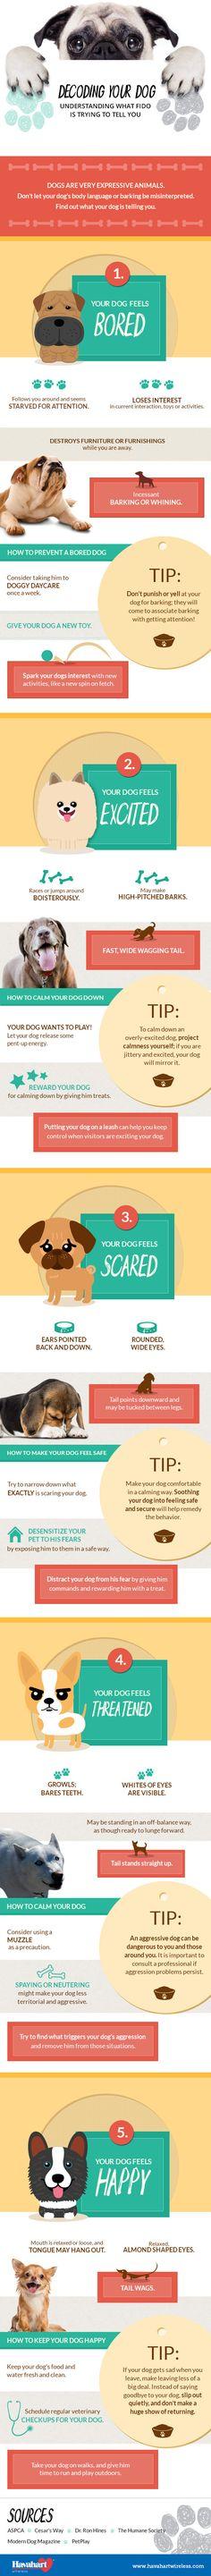 Decoding Your Dog: Understanding Dog Language